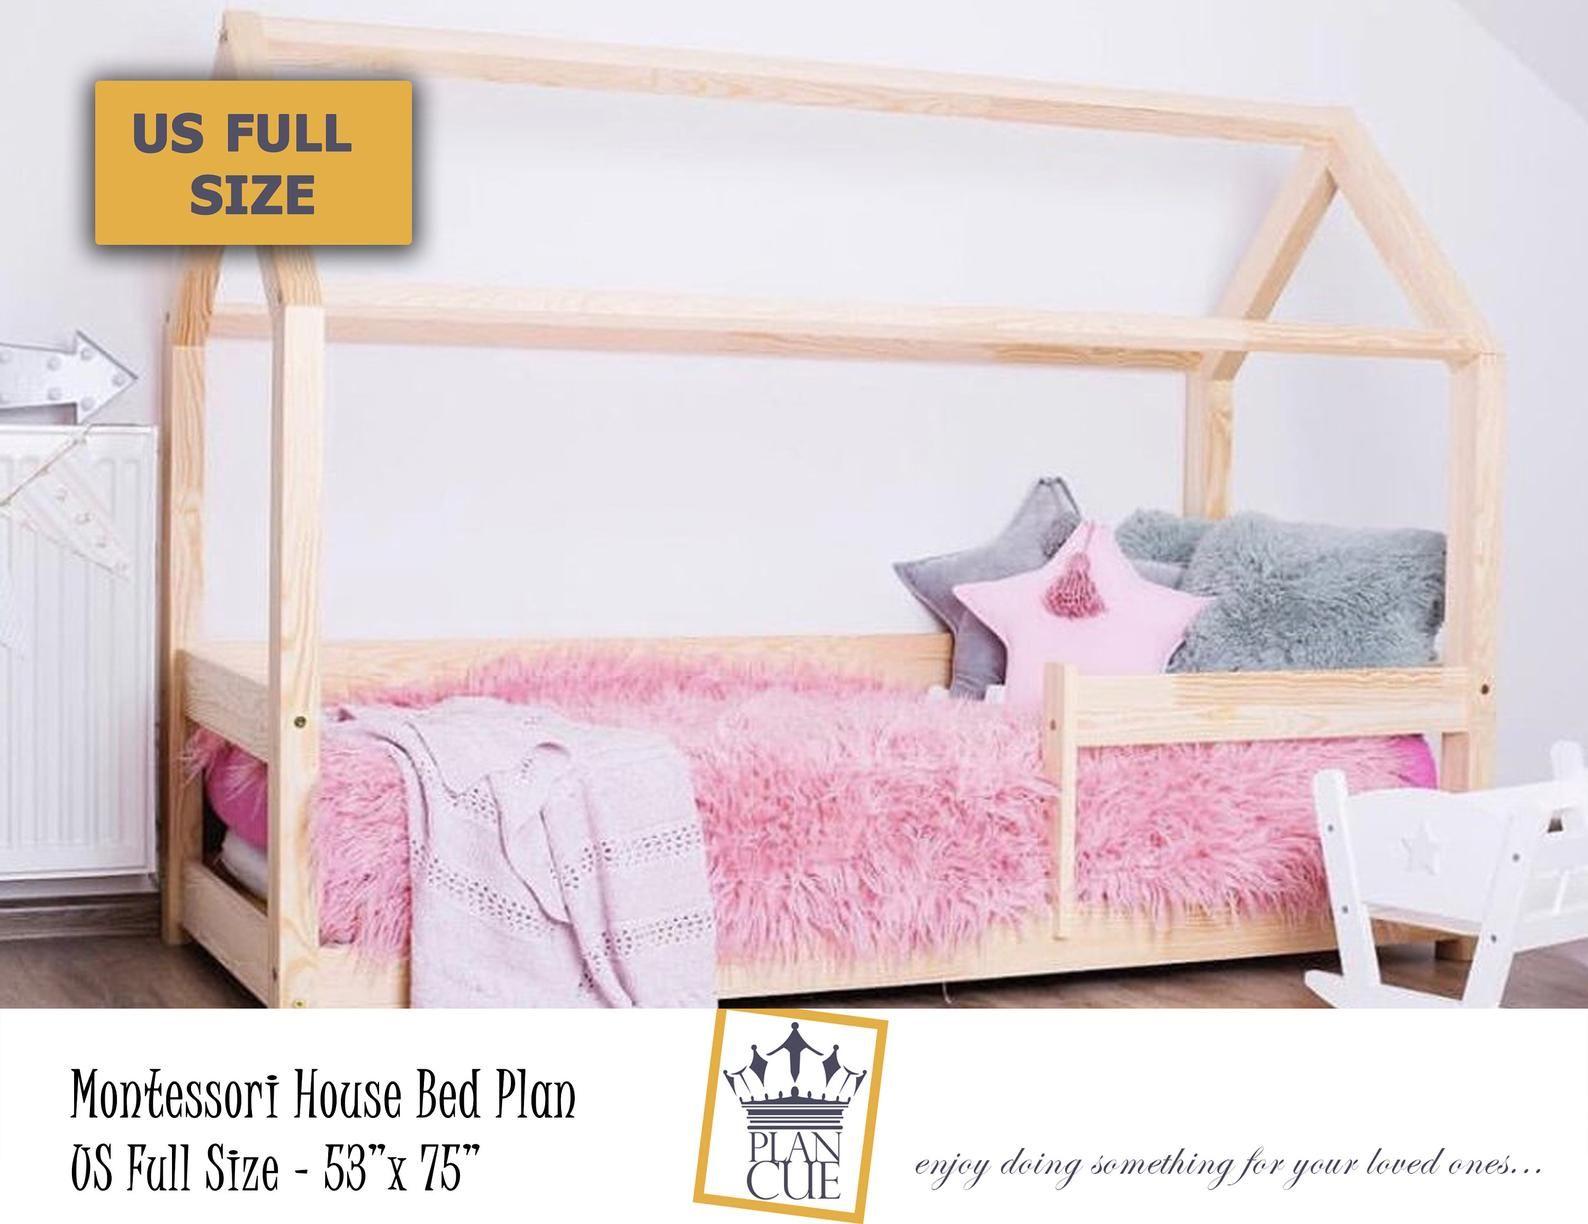 Montessori house bed plan Full size Toddler Bed wood bed   Etsy en 2020   Lit cabane, Lit maison ...